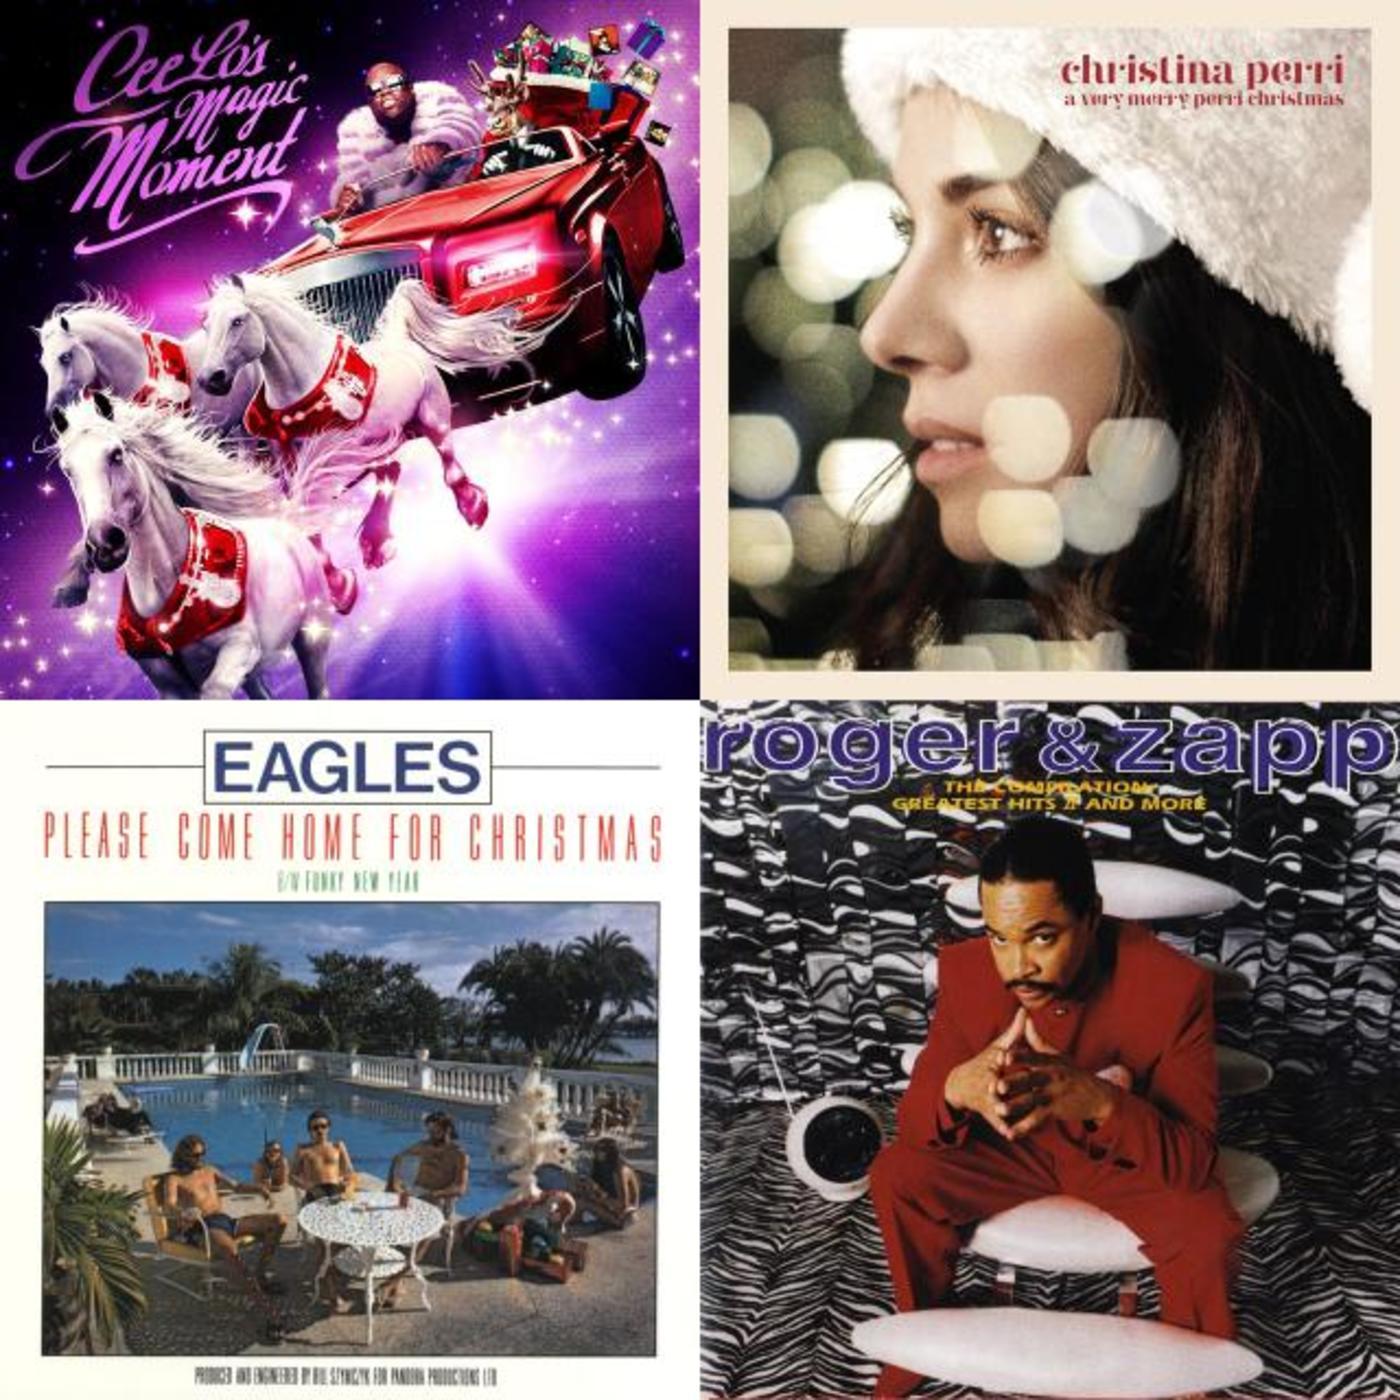 eagles christmas song guitar chords